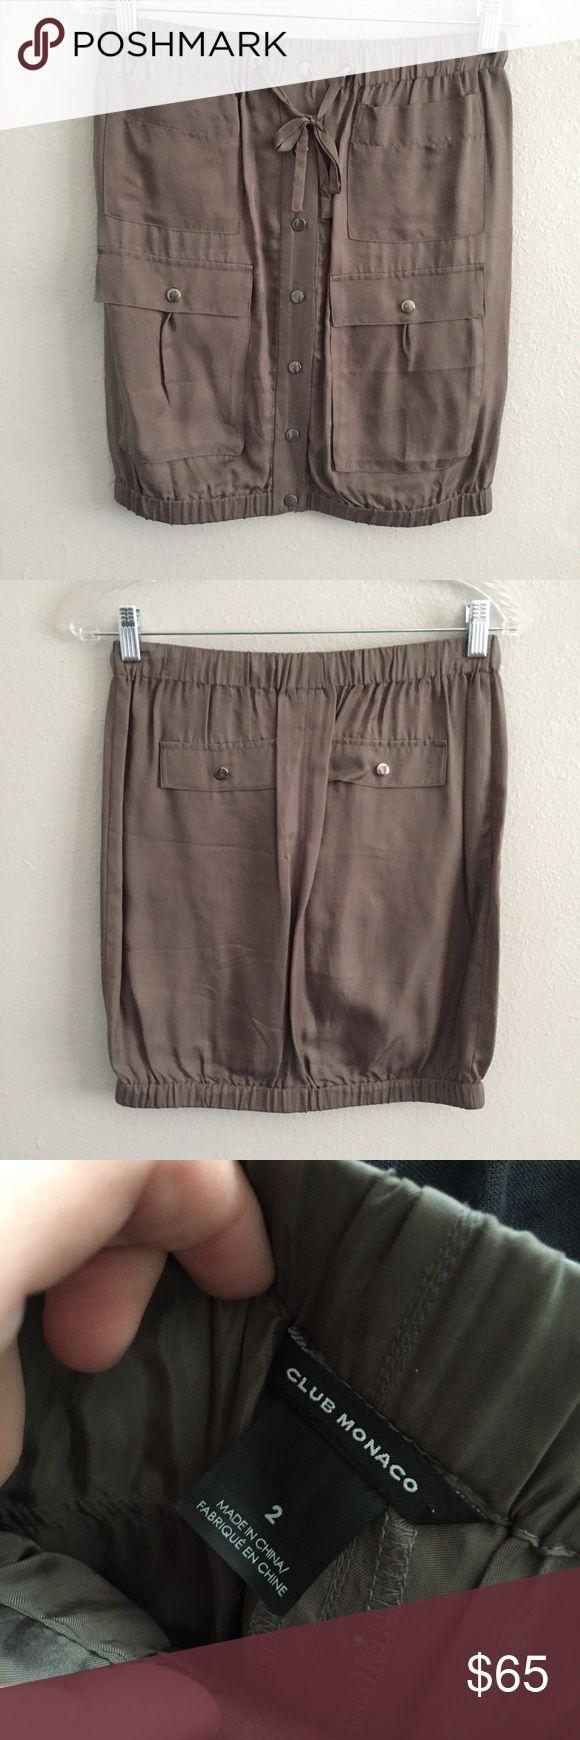 Club Monaco - Military Skirt Military inspired skirt. Hits right about the knee. 100% Cupro Silk Club Monaco Skirts Mini